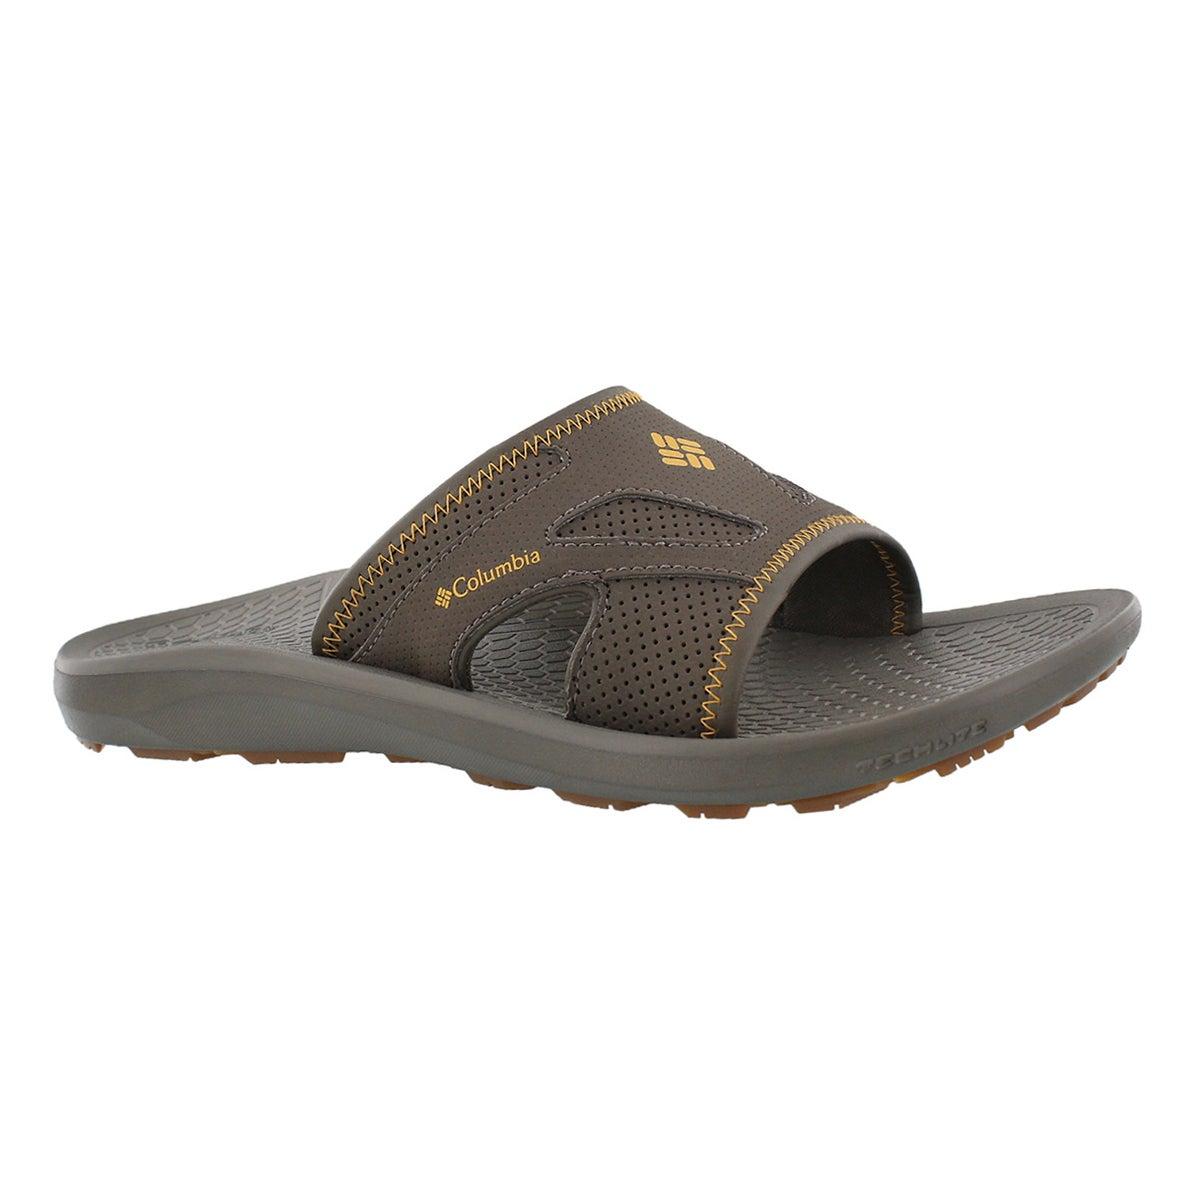 Men's TECHSUN SLIDE mud casual sandals